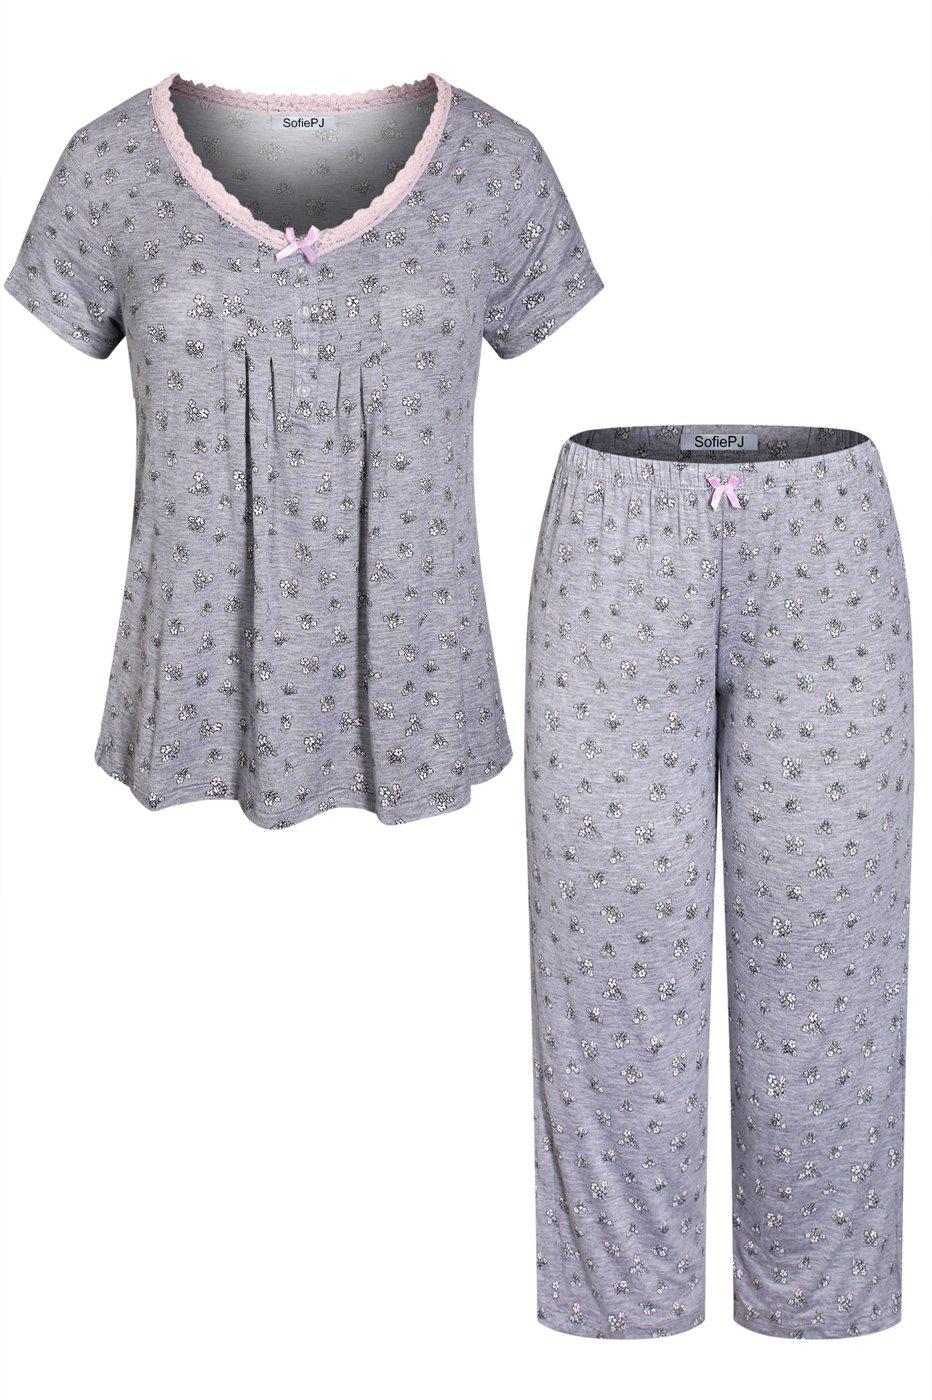 SofiePJ Women's Rayon Printed Top with Capri Pants Pajama Set Grey Pink XL(576510)